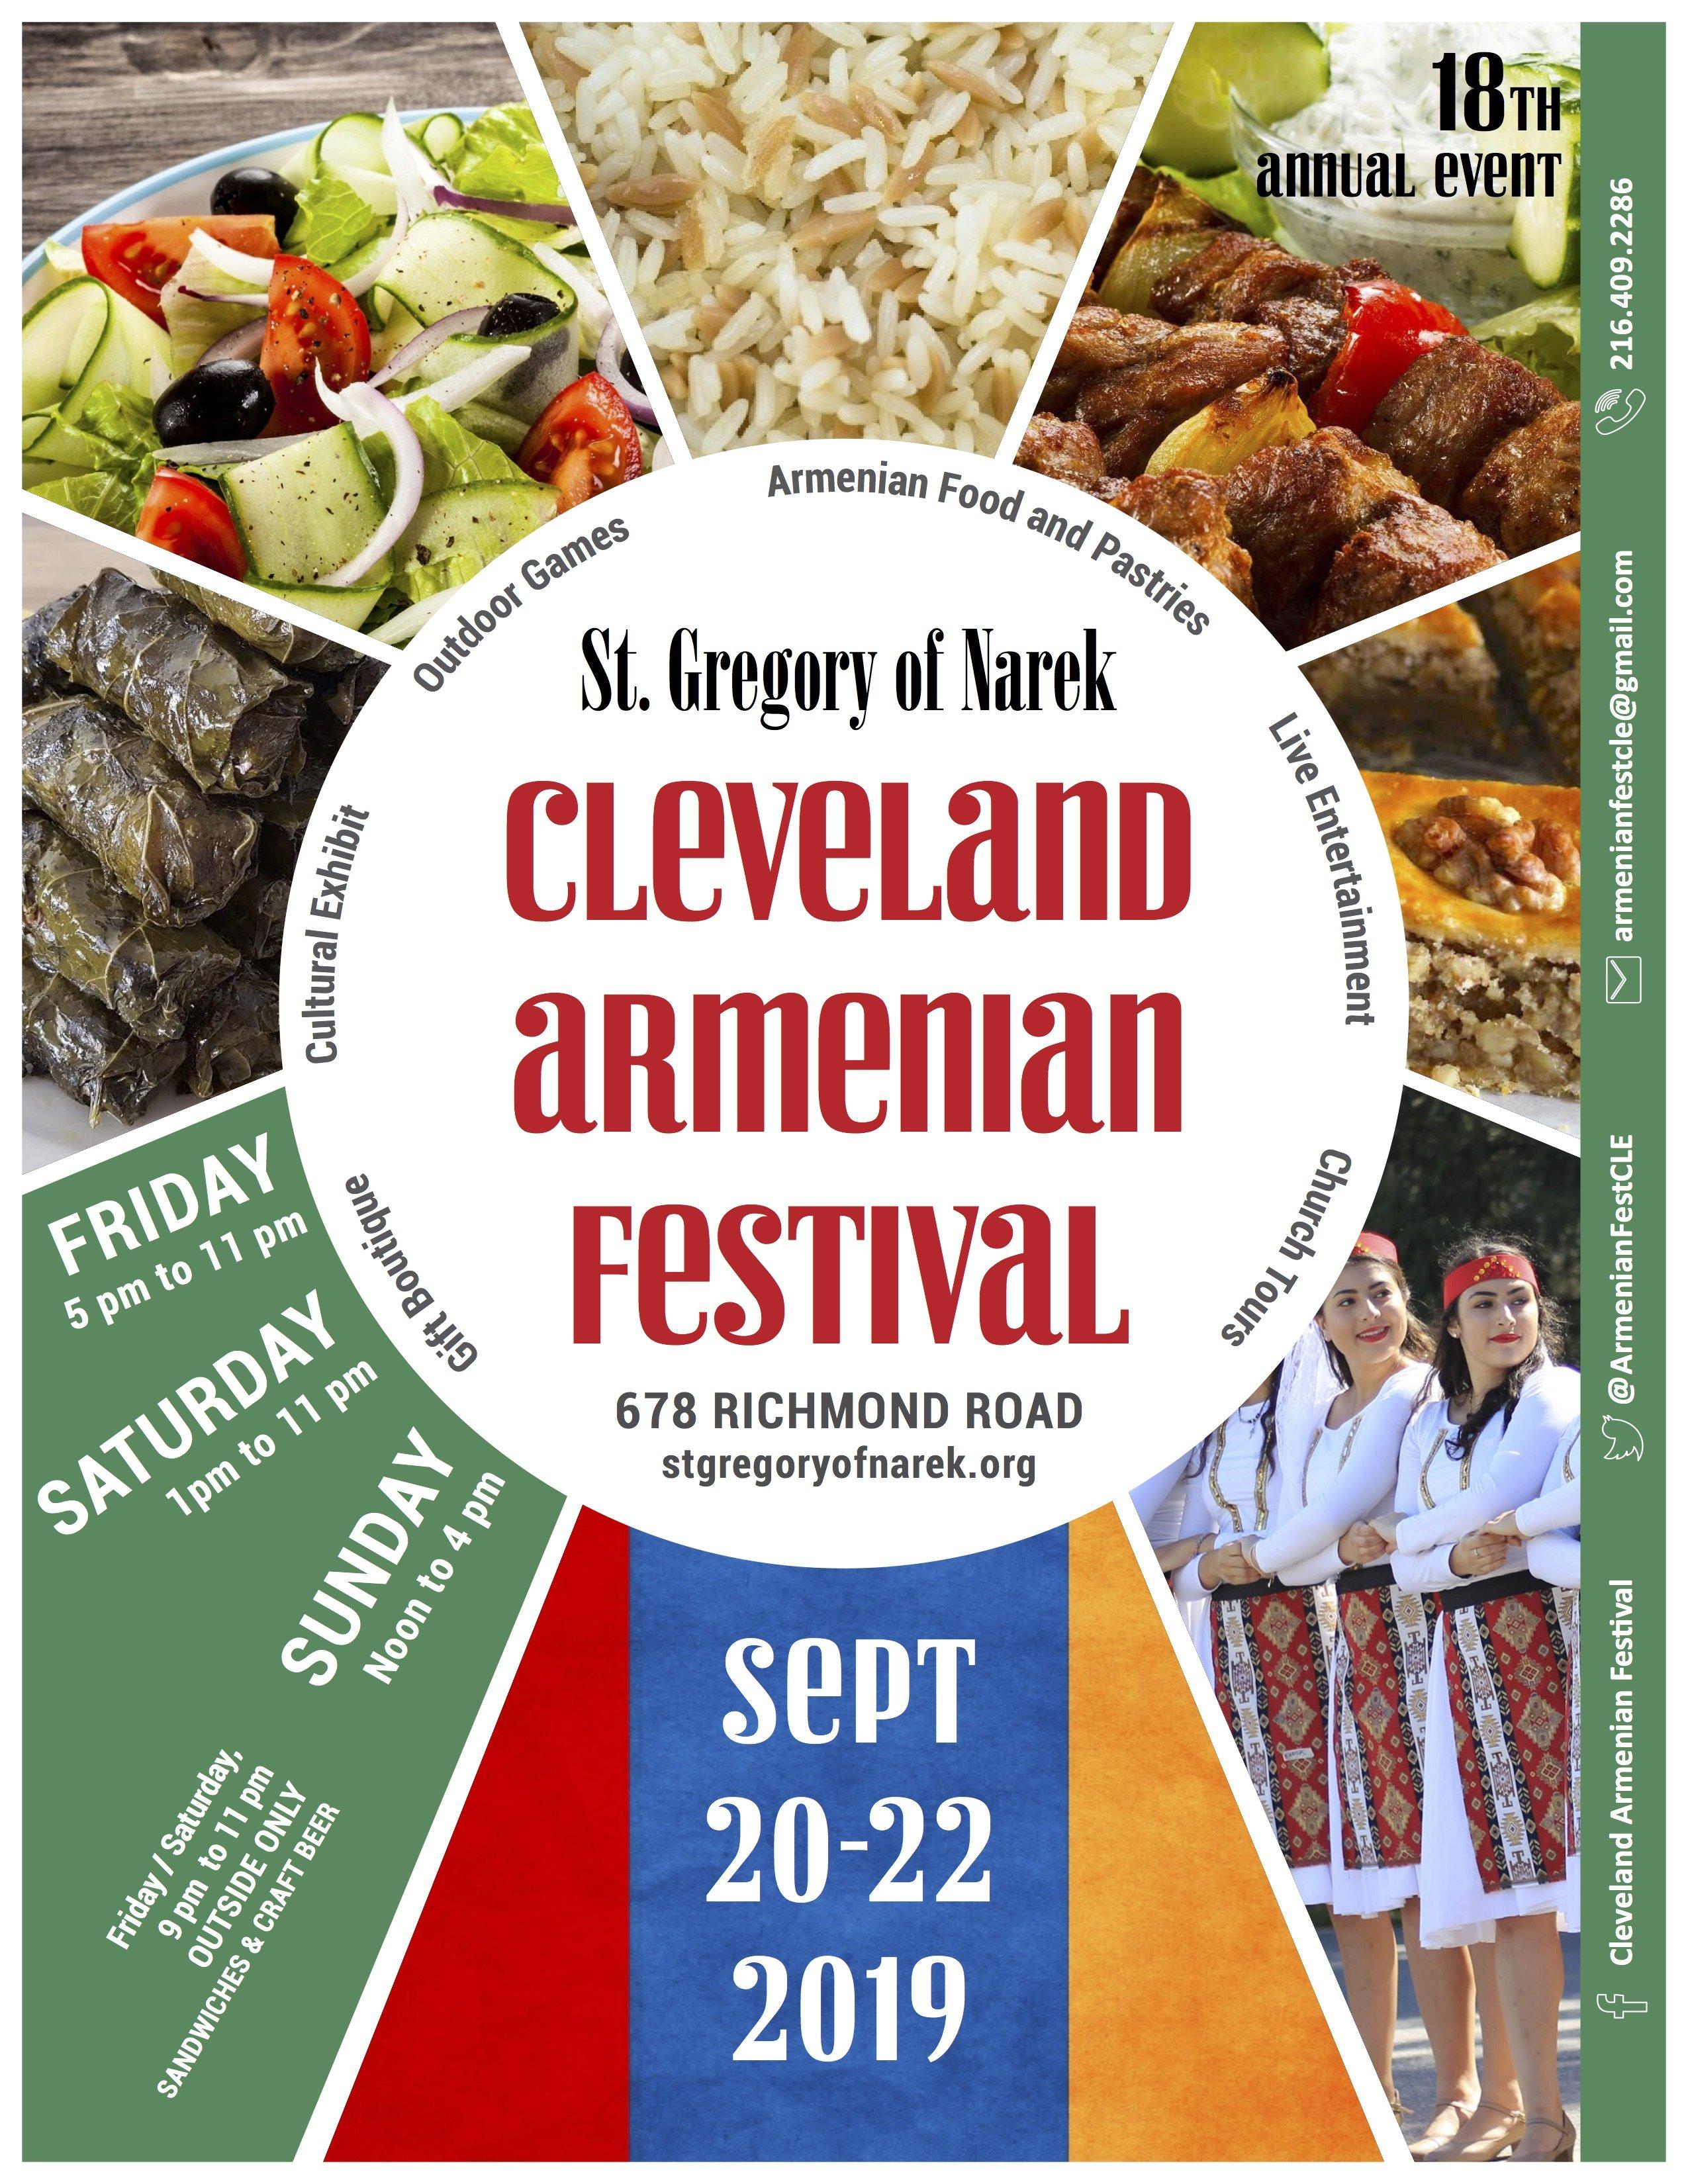 Armenian Festival in Cleveland